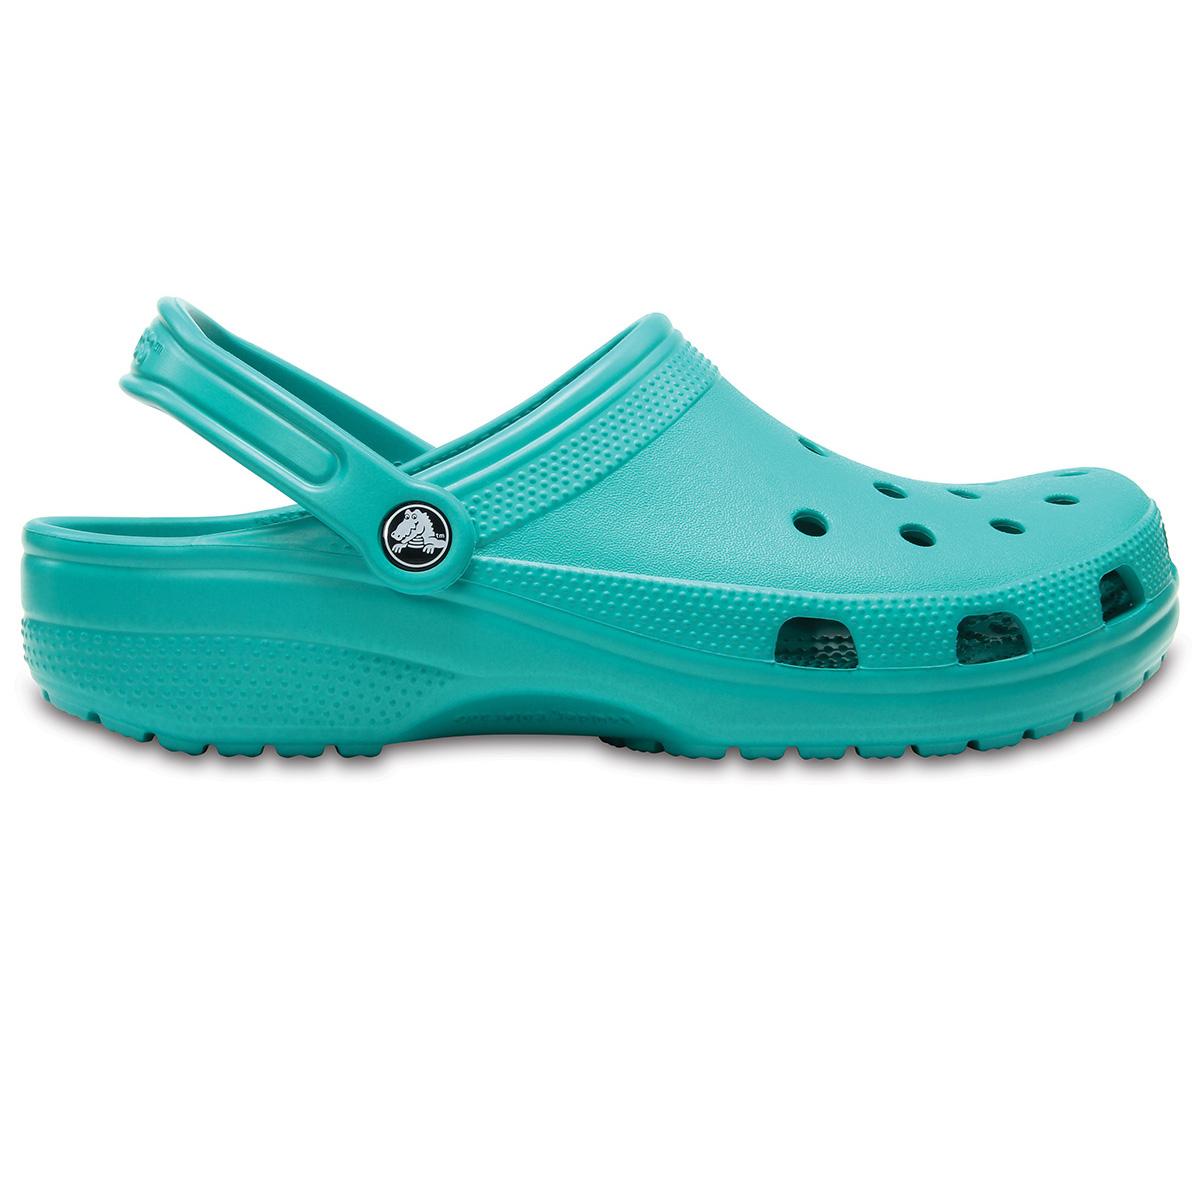 Crocs Classic - Tropikal Deniz mavisi